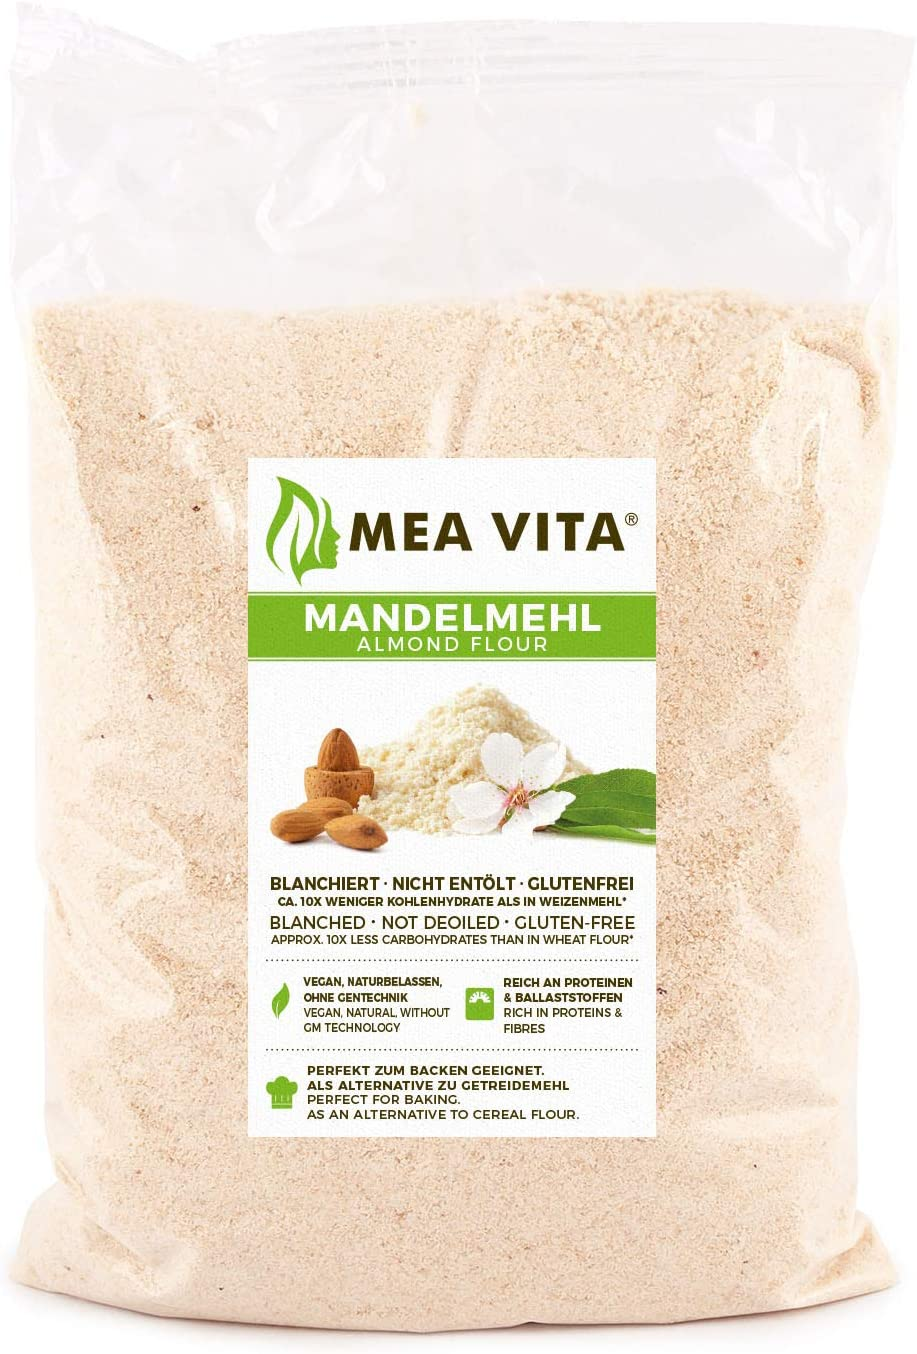 Meavita Harina De Almendras Natural, Blanqueada, 1 Paquete (1 X 1000 g)